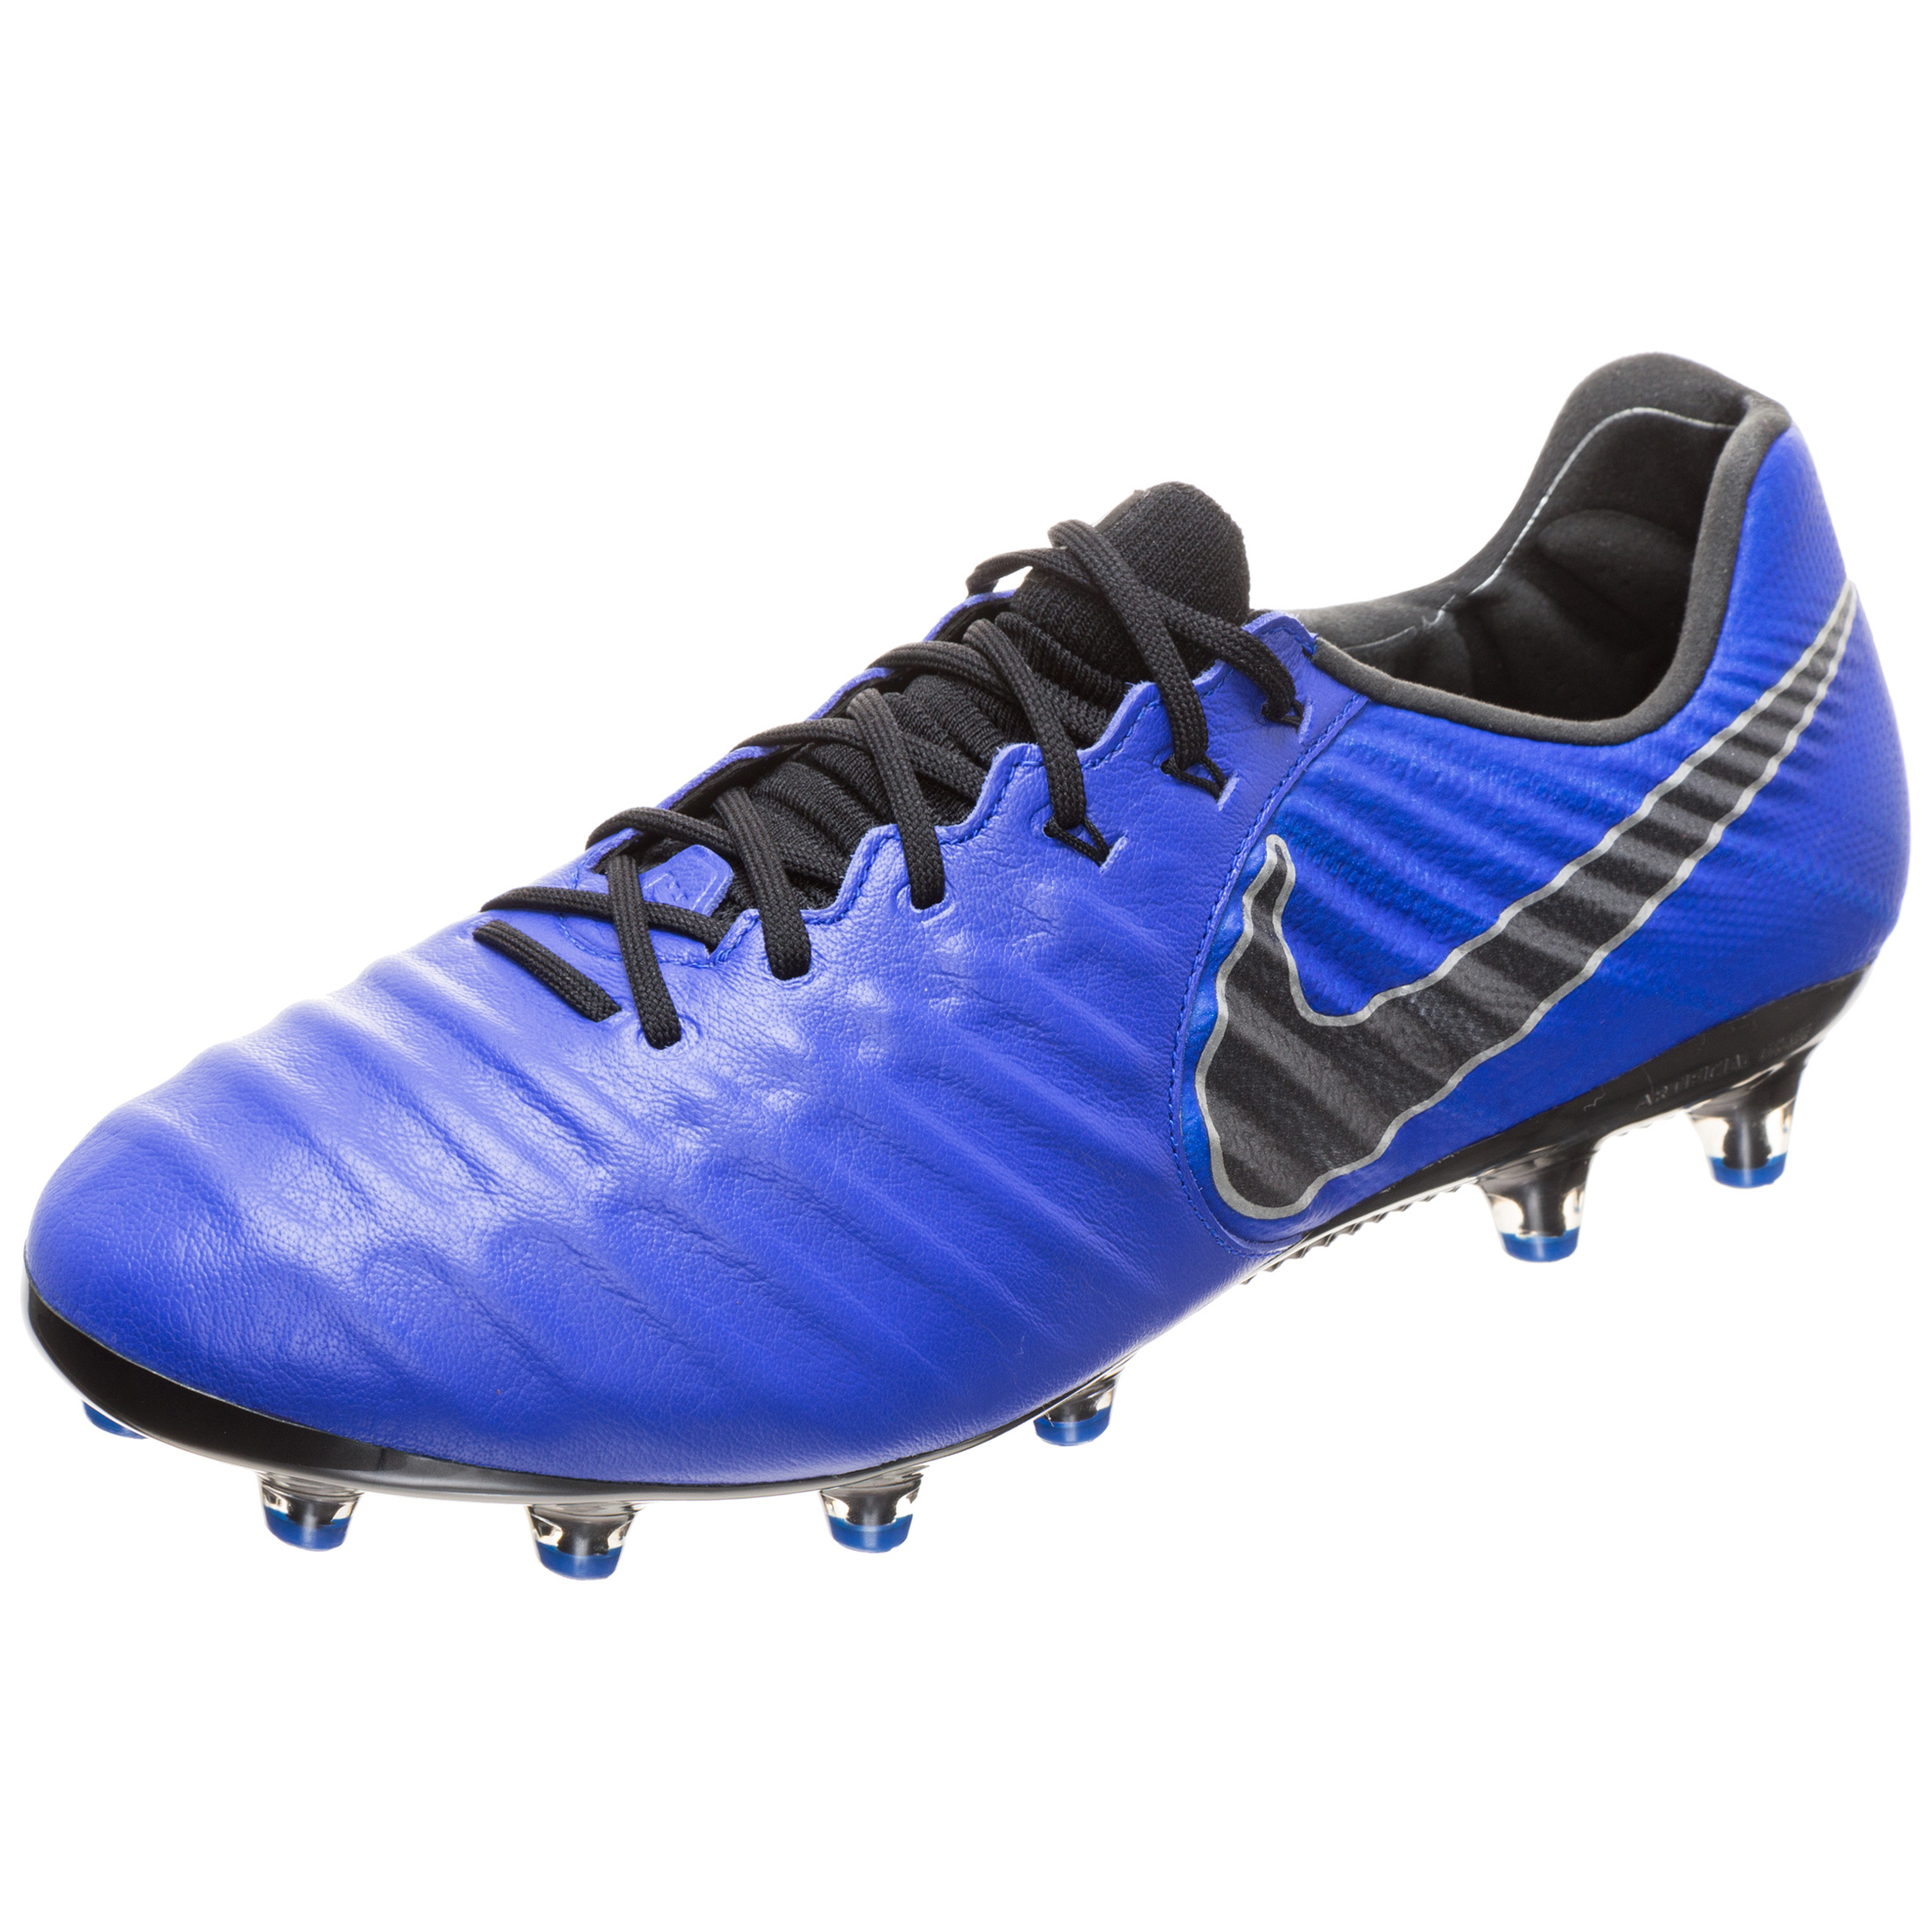 Nike Legend VII Elite AG-PRO Artificial-Grass Football Boot - Blue ... c585e3b5555bf